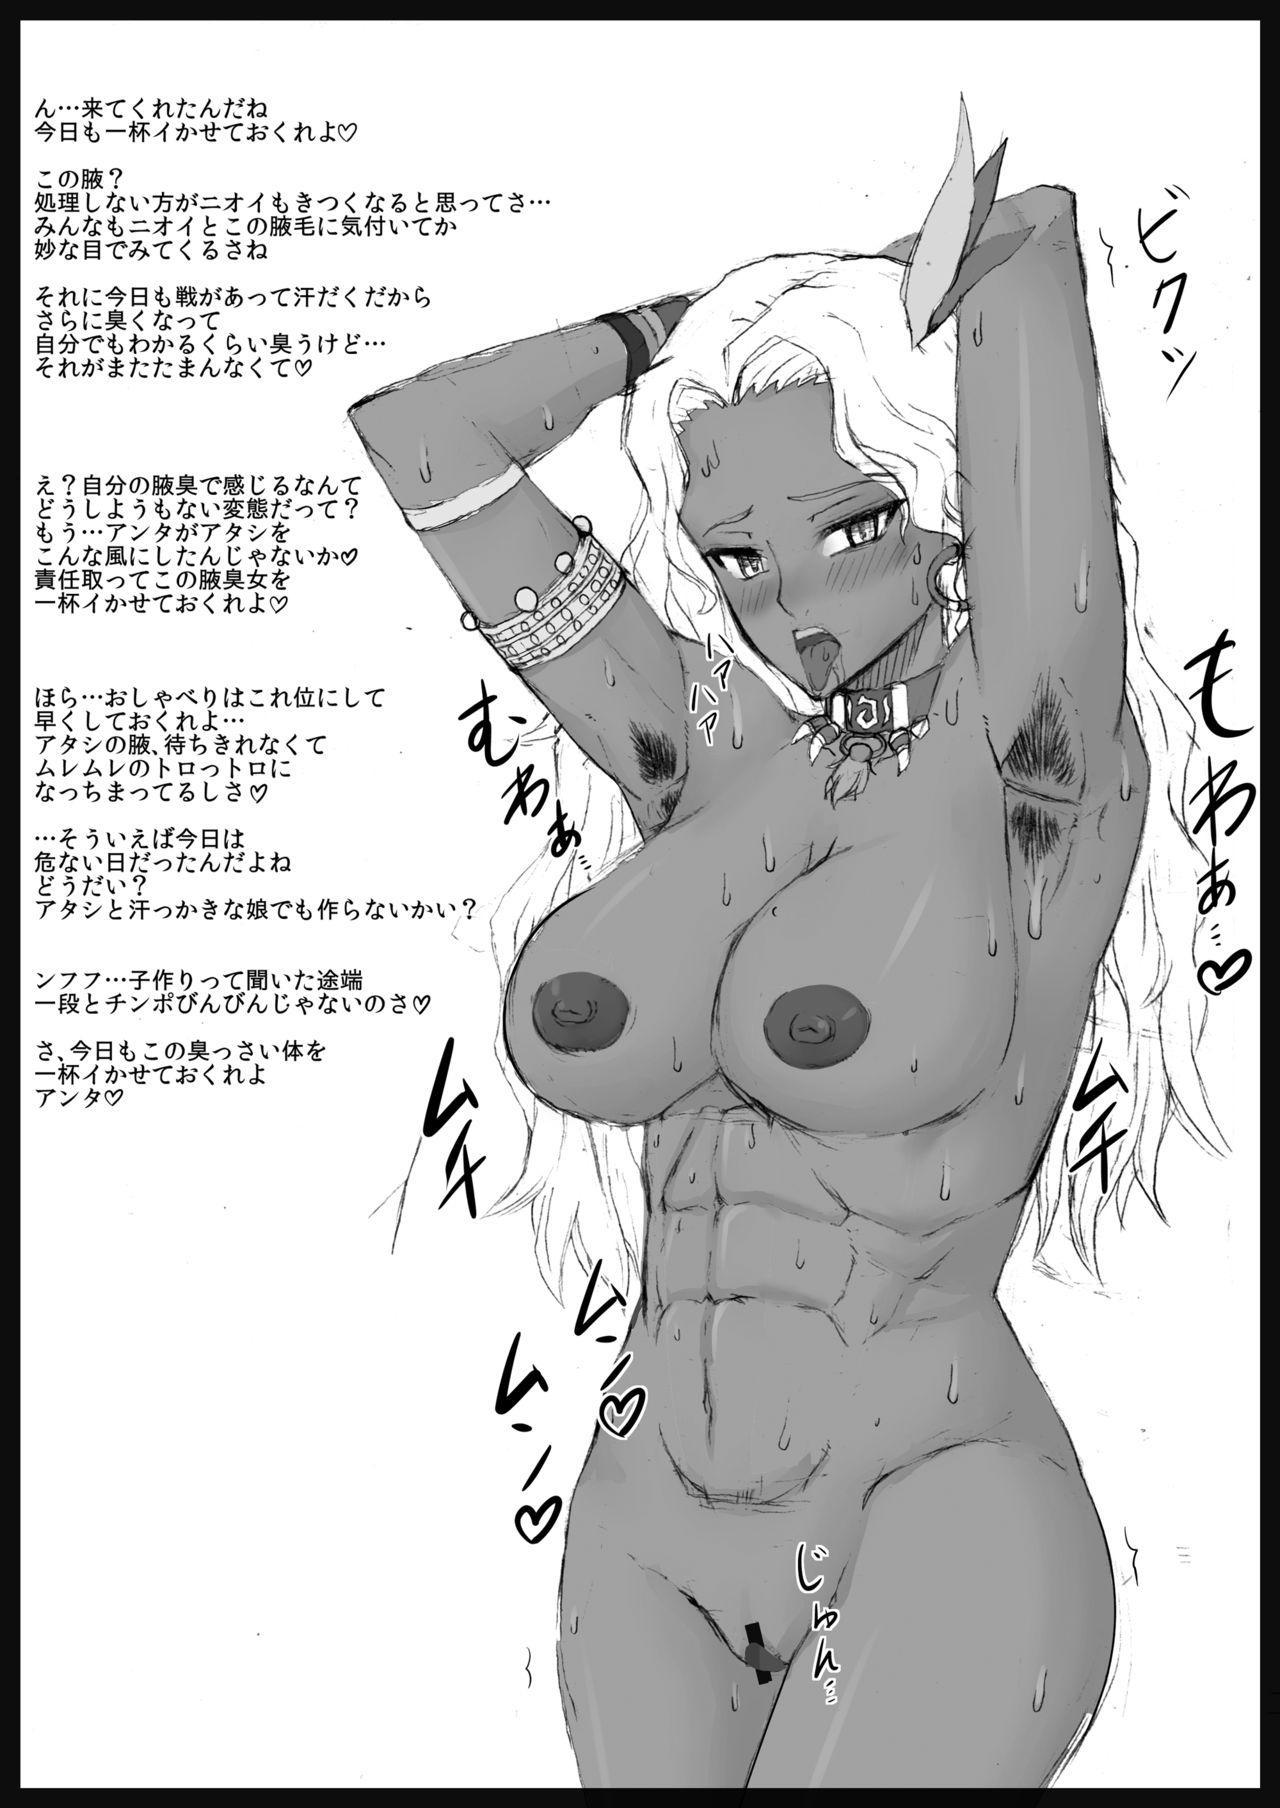 Kusurizuke! Sennou! Kikai Kaizou! Kuroochi Bitch-ka Heroine +α 206